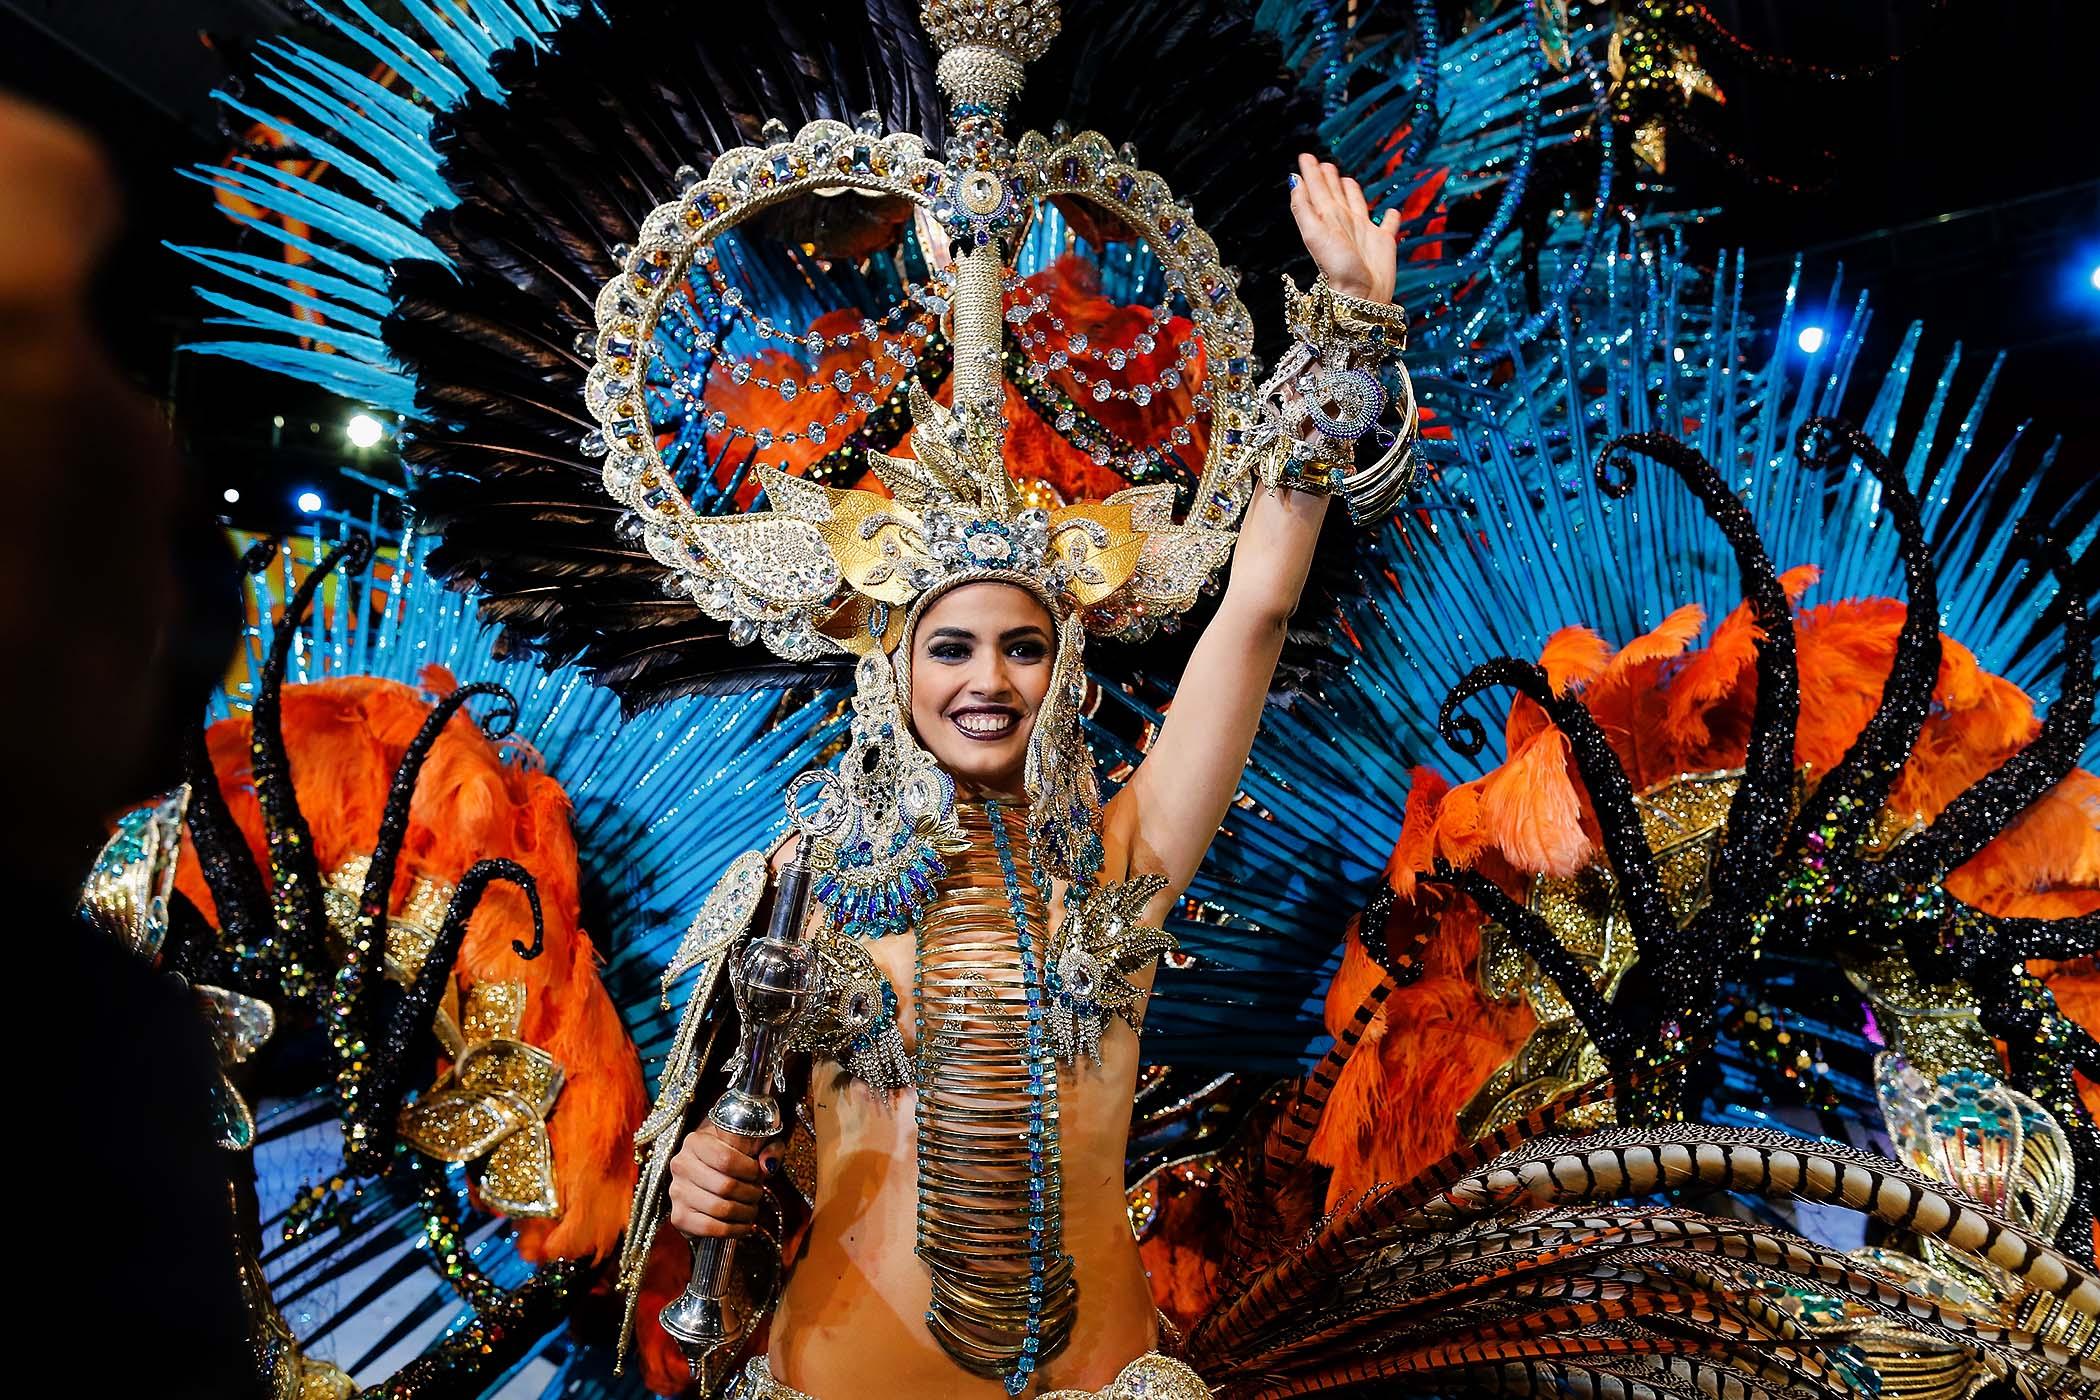 Best Carnivals of Europe